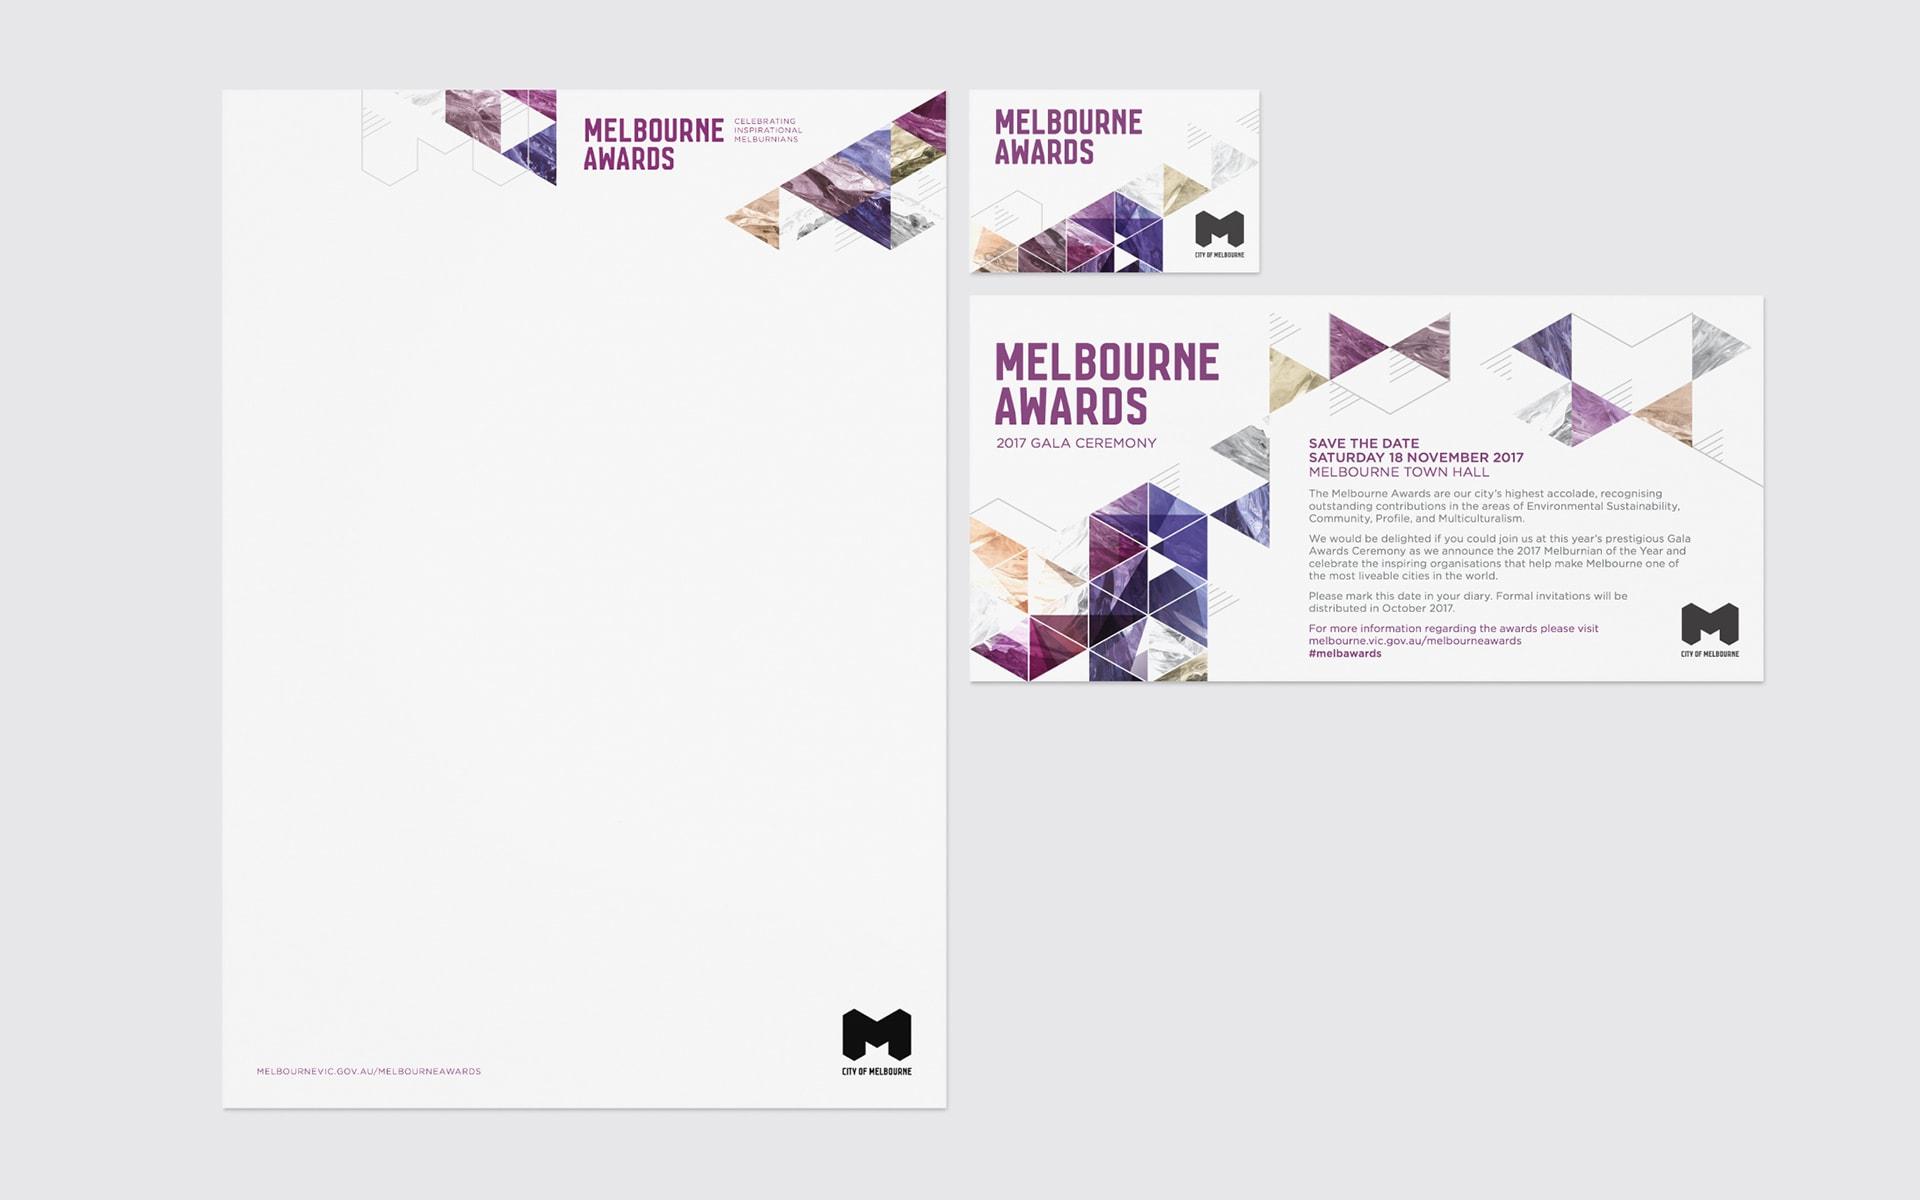 City of Melbourne 2017 Melbourne Awards